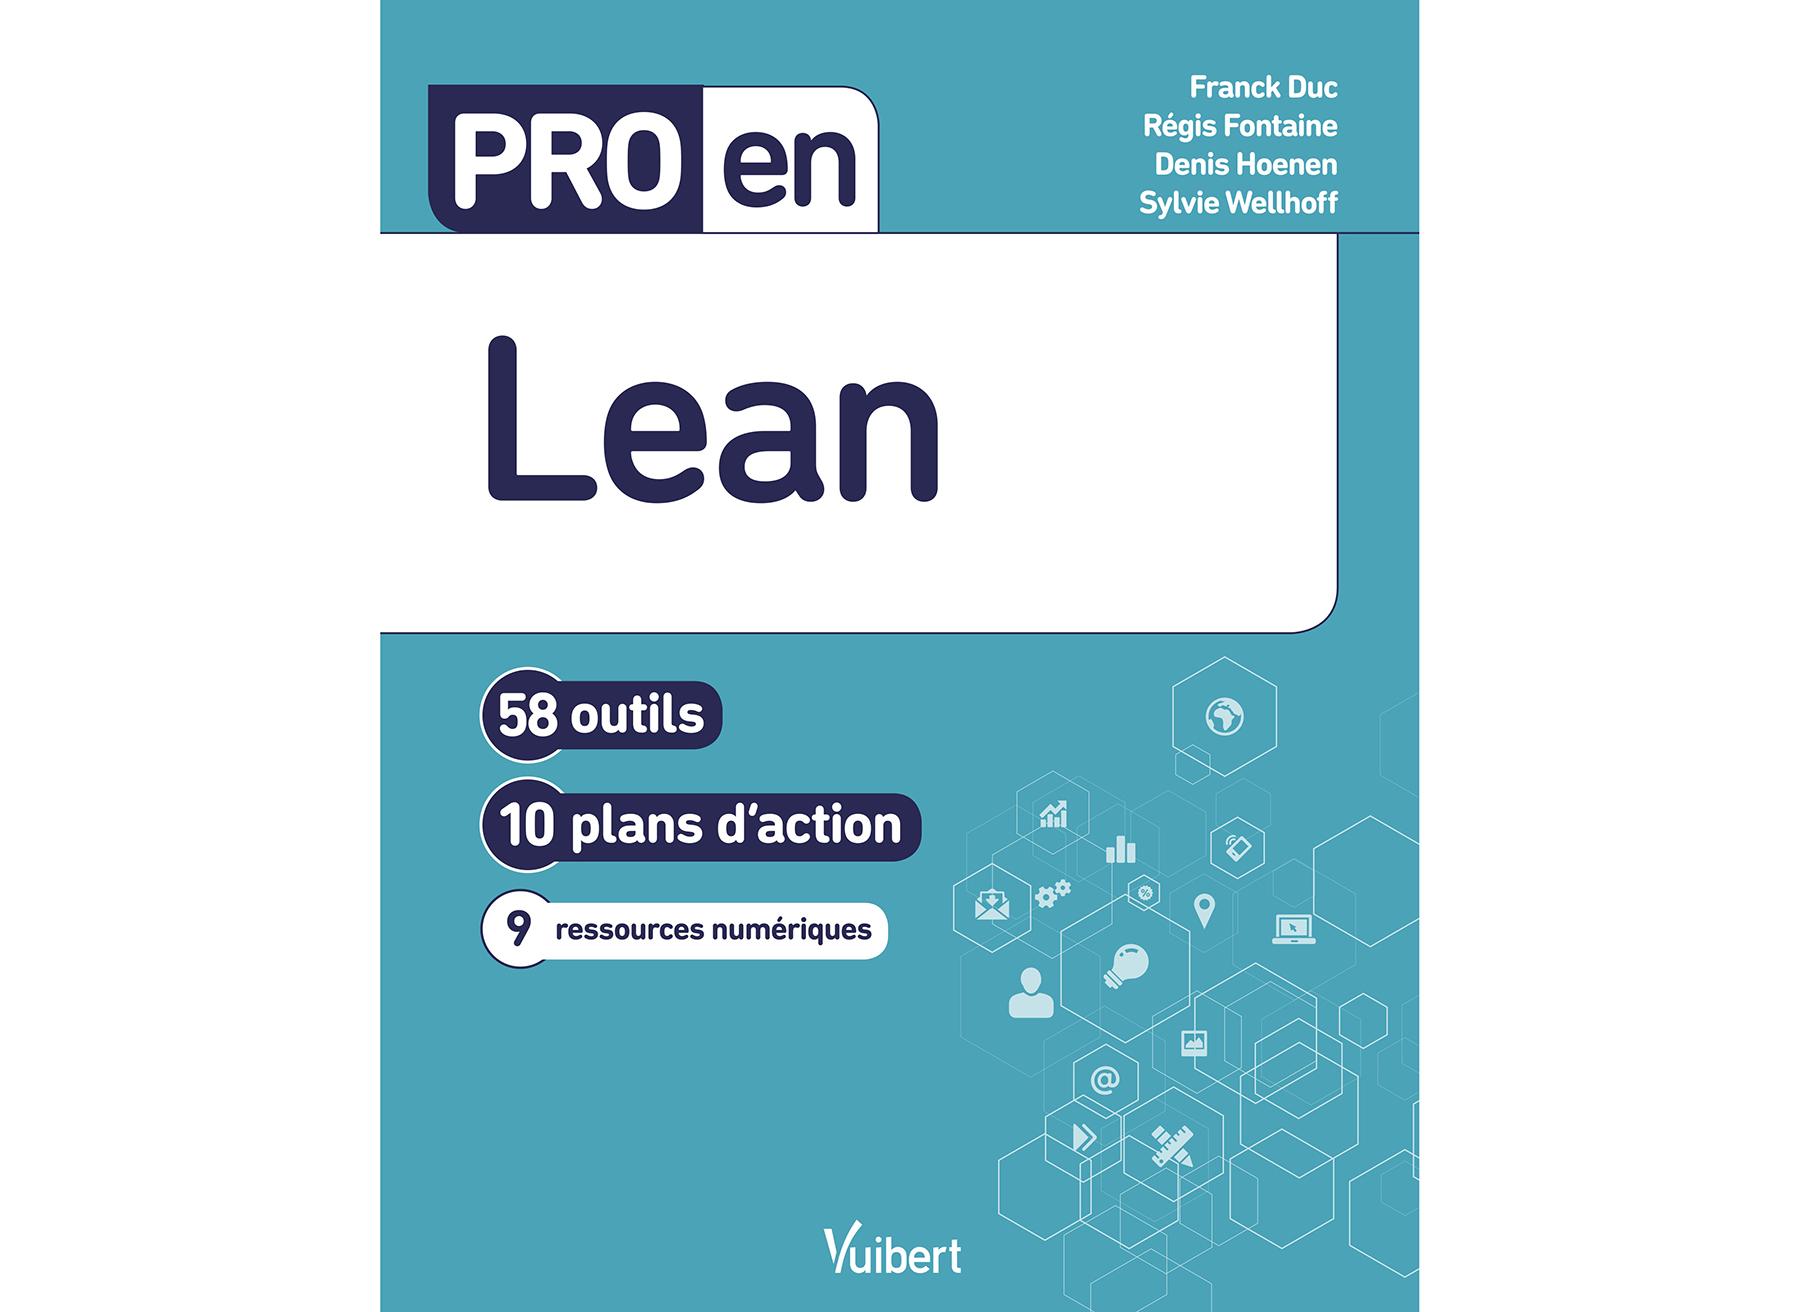 Livre : Pro en Lean